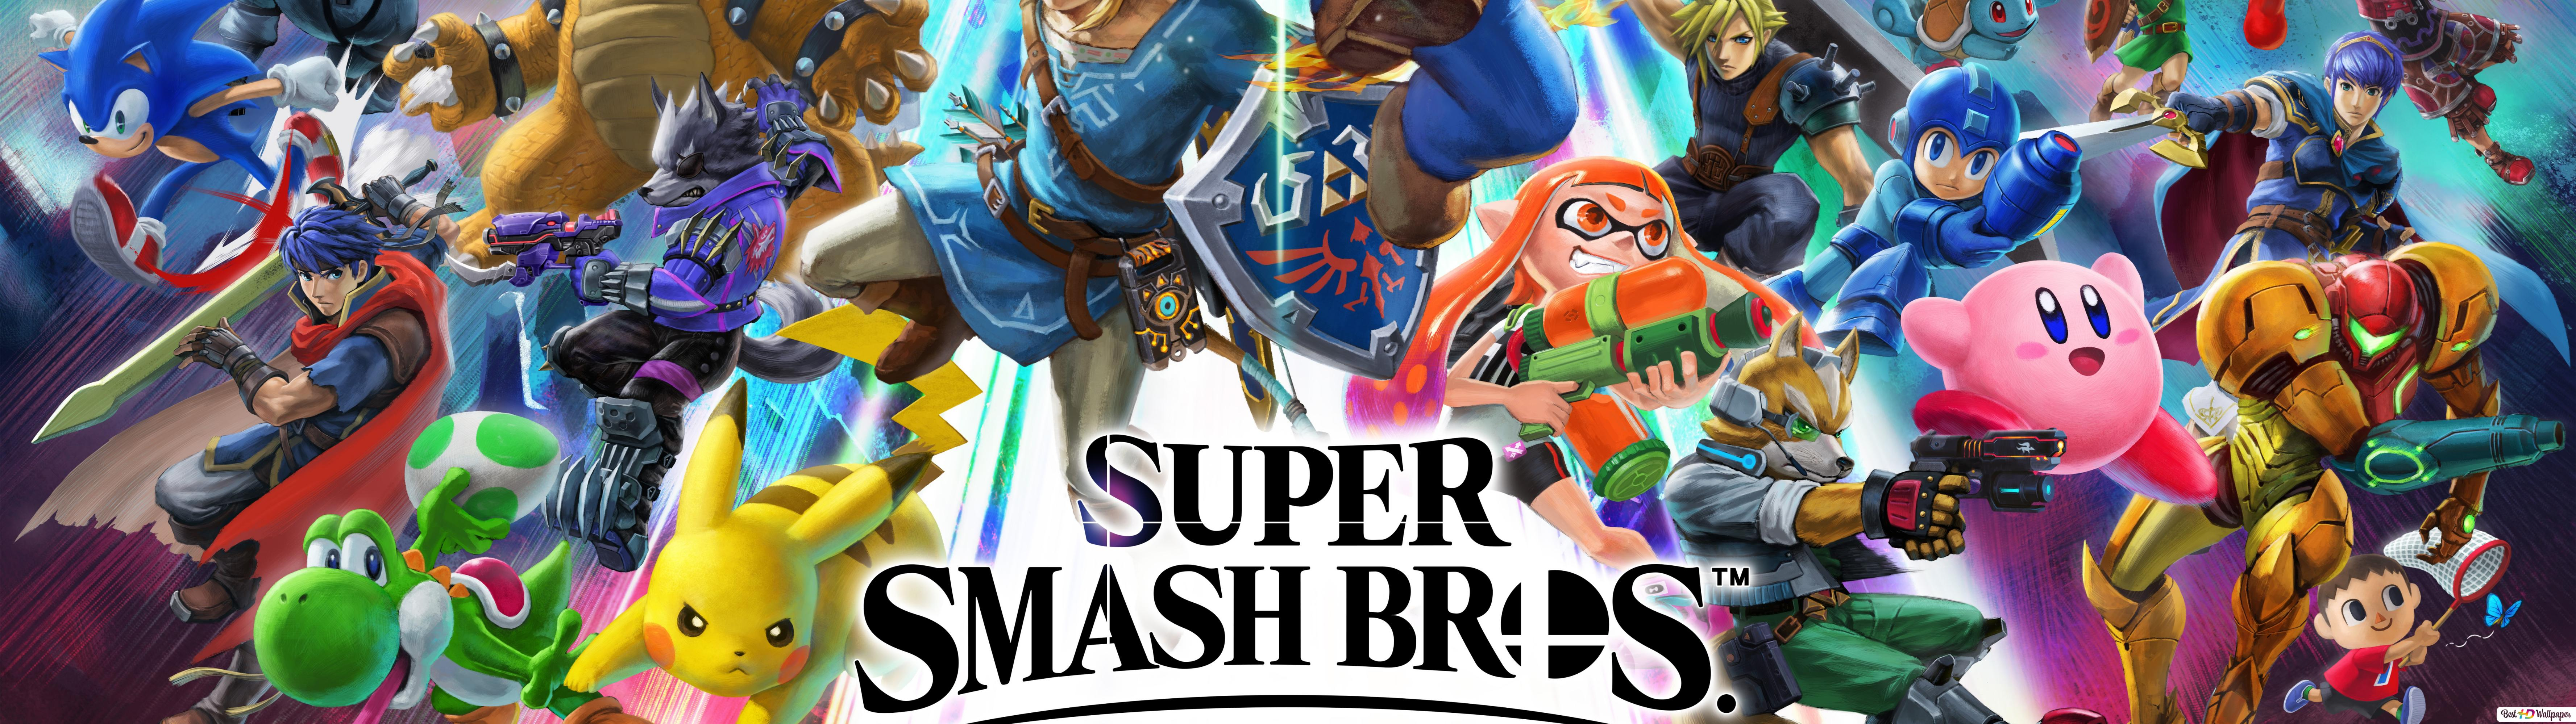 Super Smash Bros Ultimate Hd Wallpaper Download